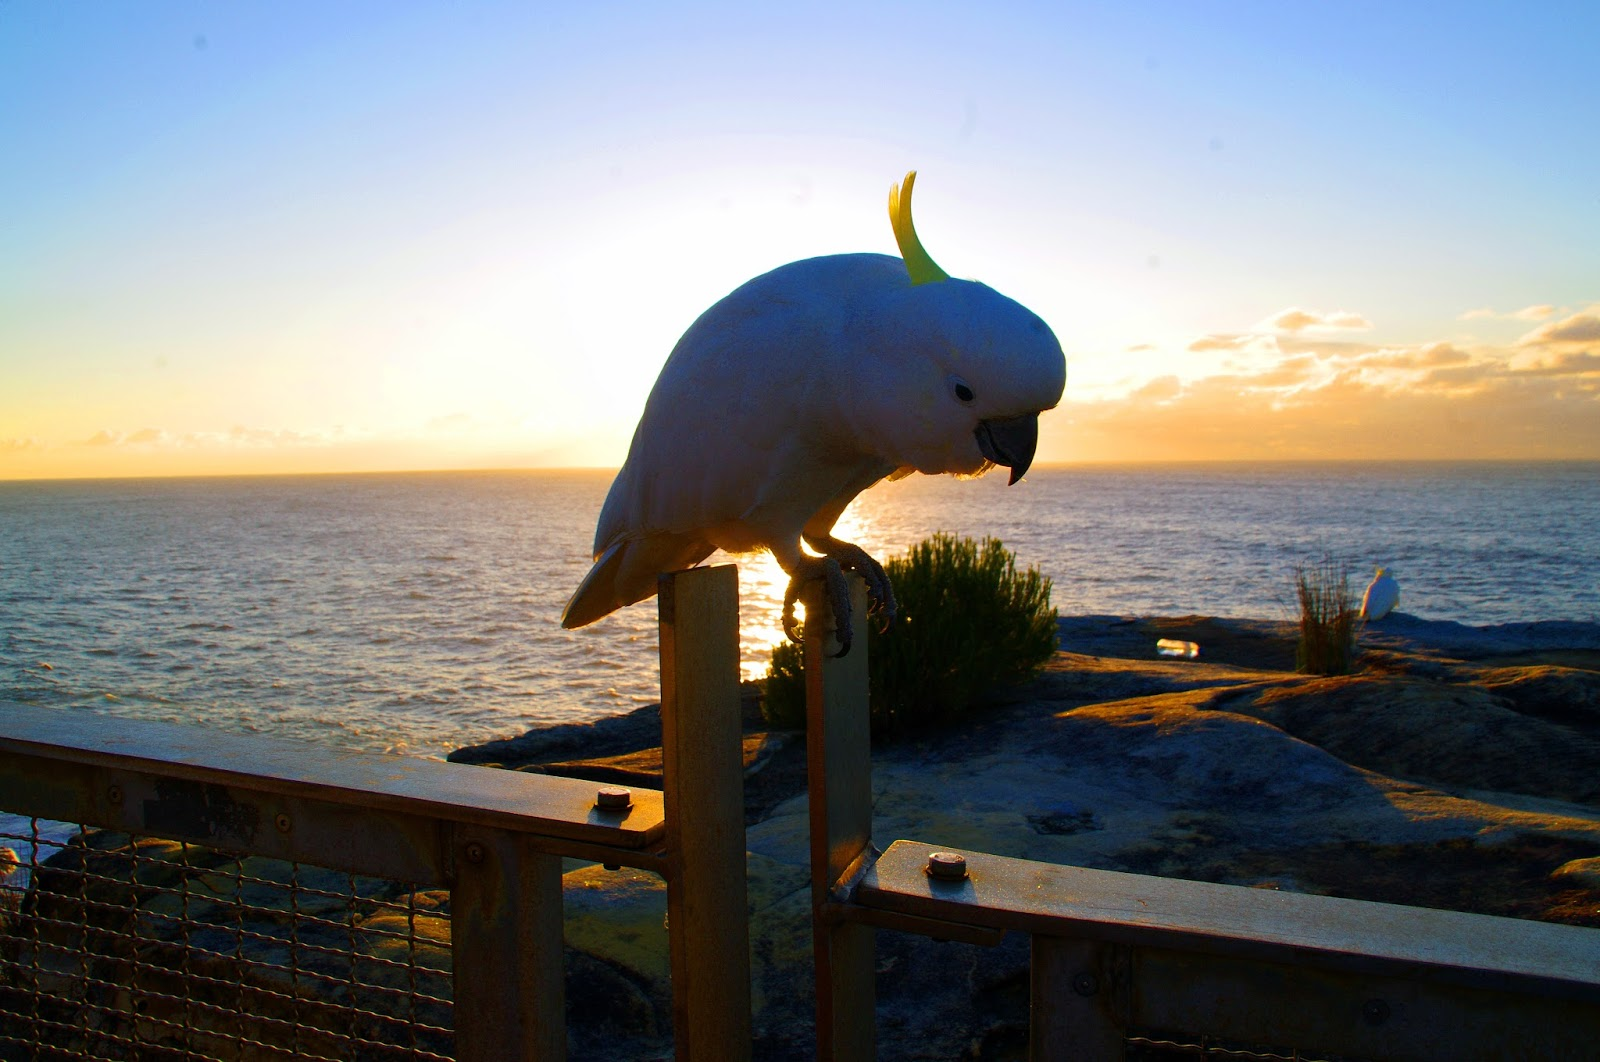 cockatoo at sunrise